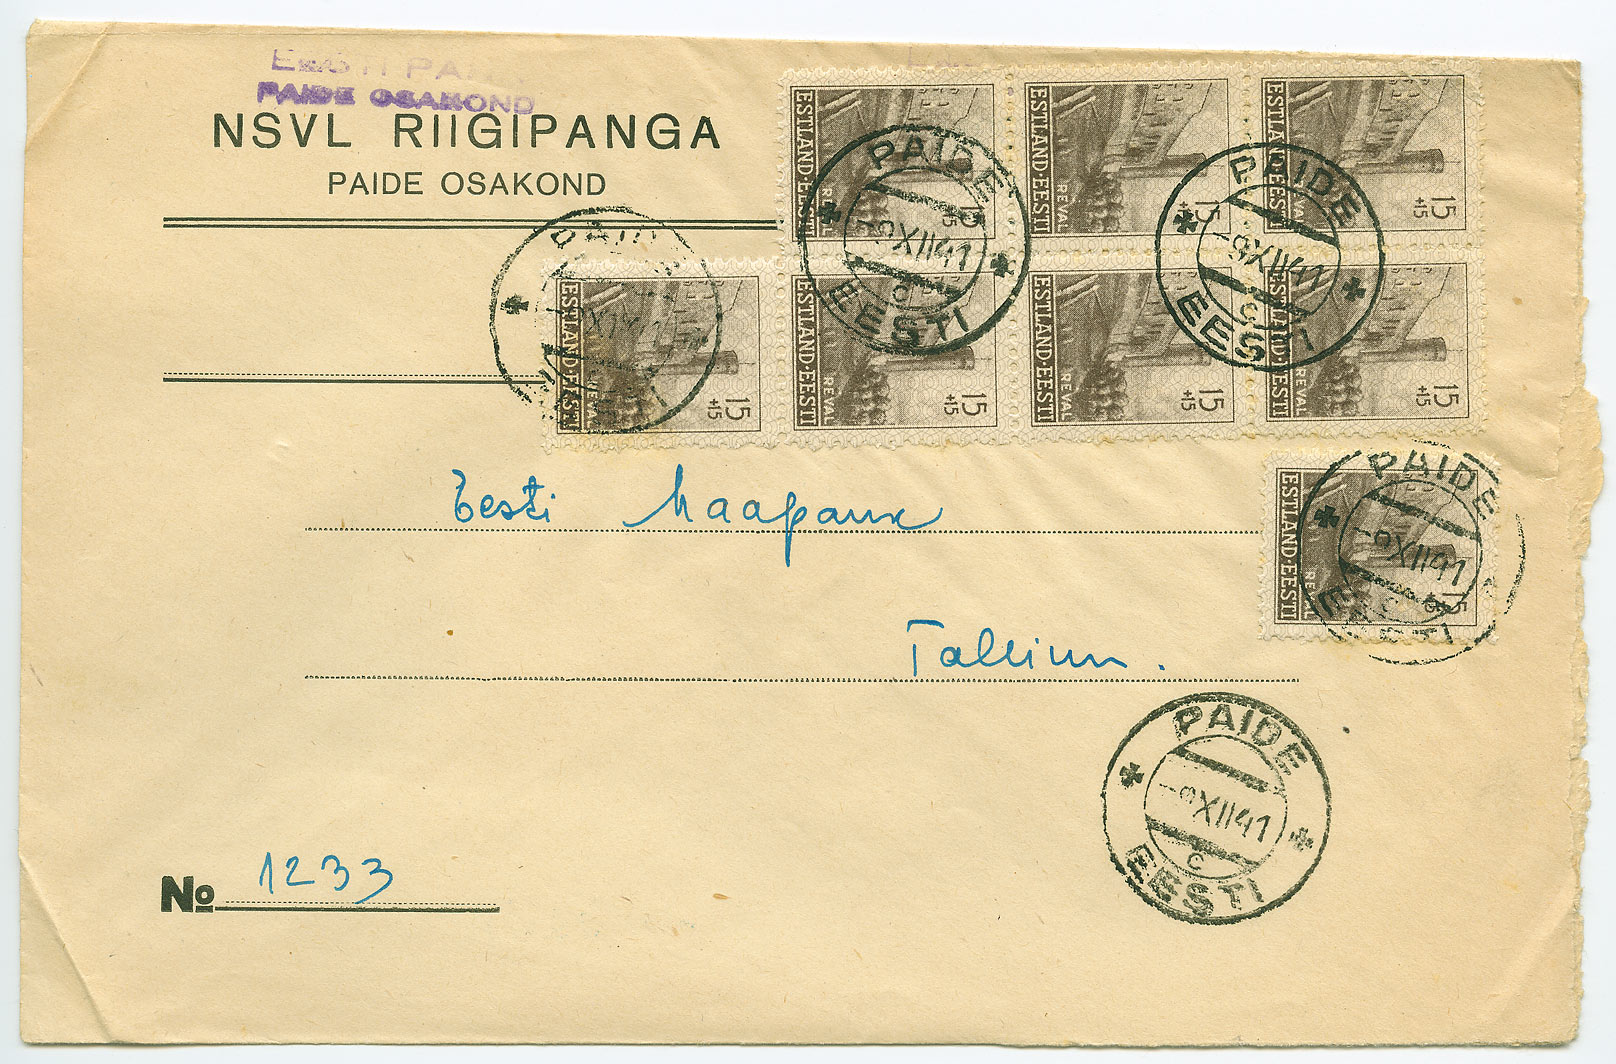 0365-NSVL-Riigipanga-Paide-